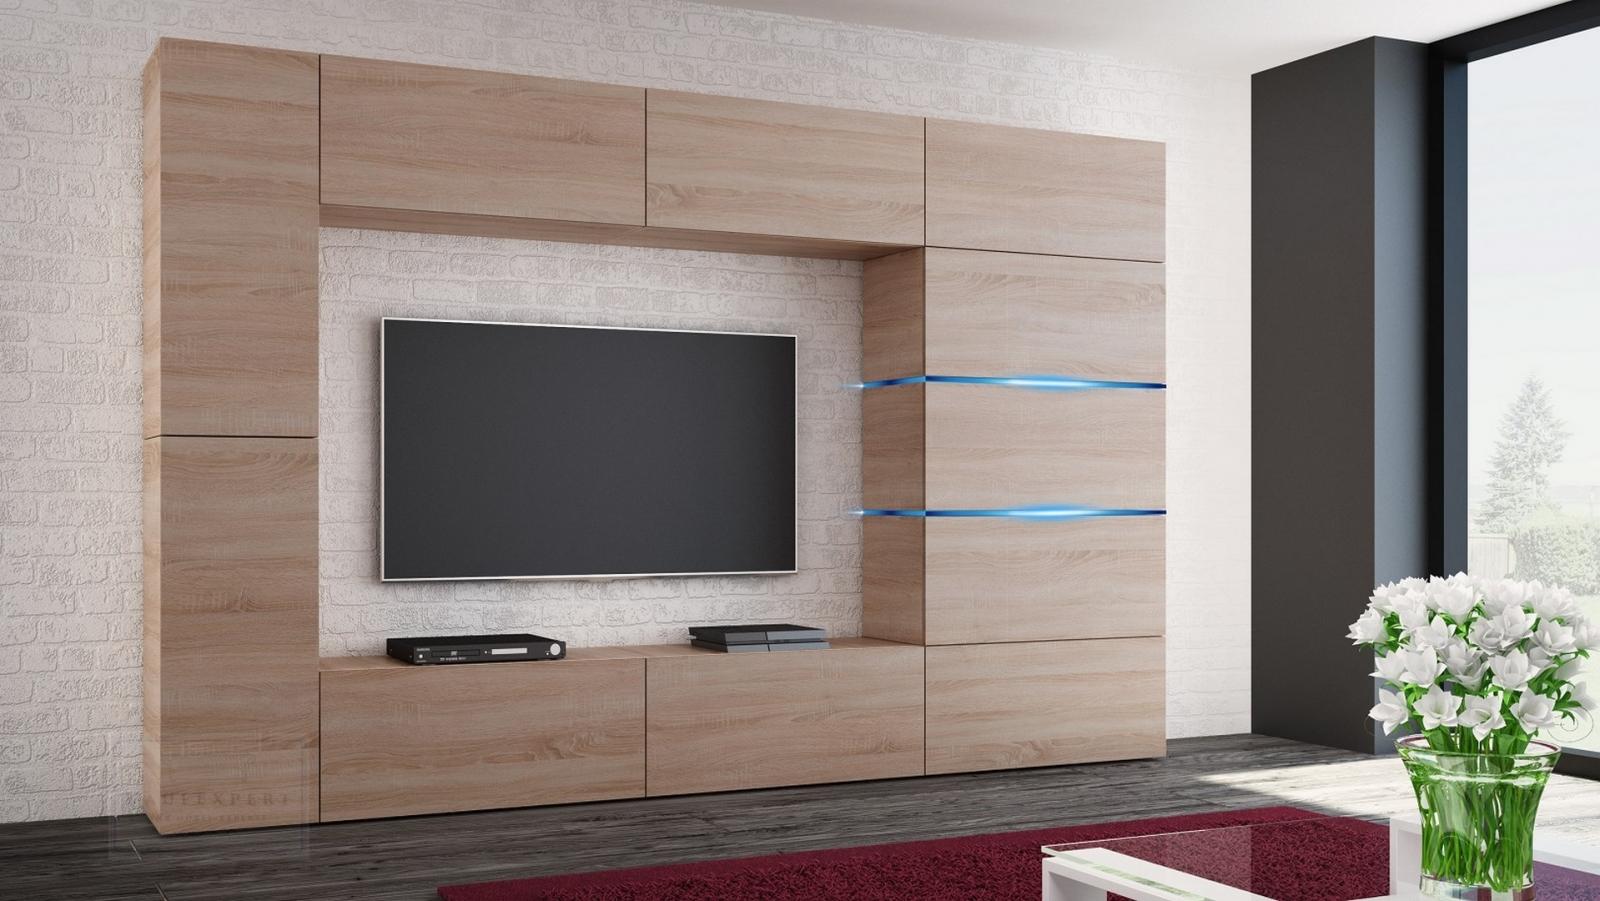 kaufexpert wohnwand shadow sonoma eiche 285 cm mediawand anbauwand medienwand design modern. Black Bedroom Furniture Sets. Home Design Ideas